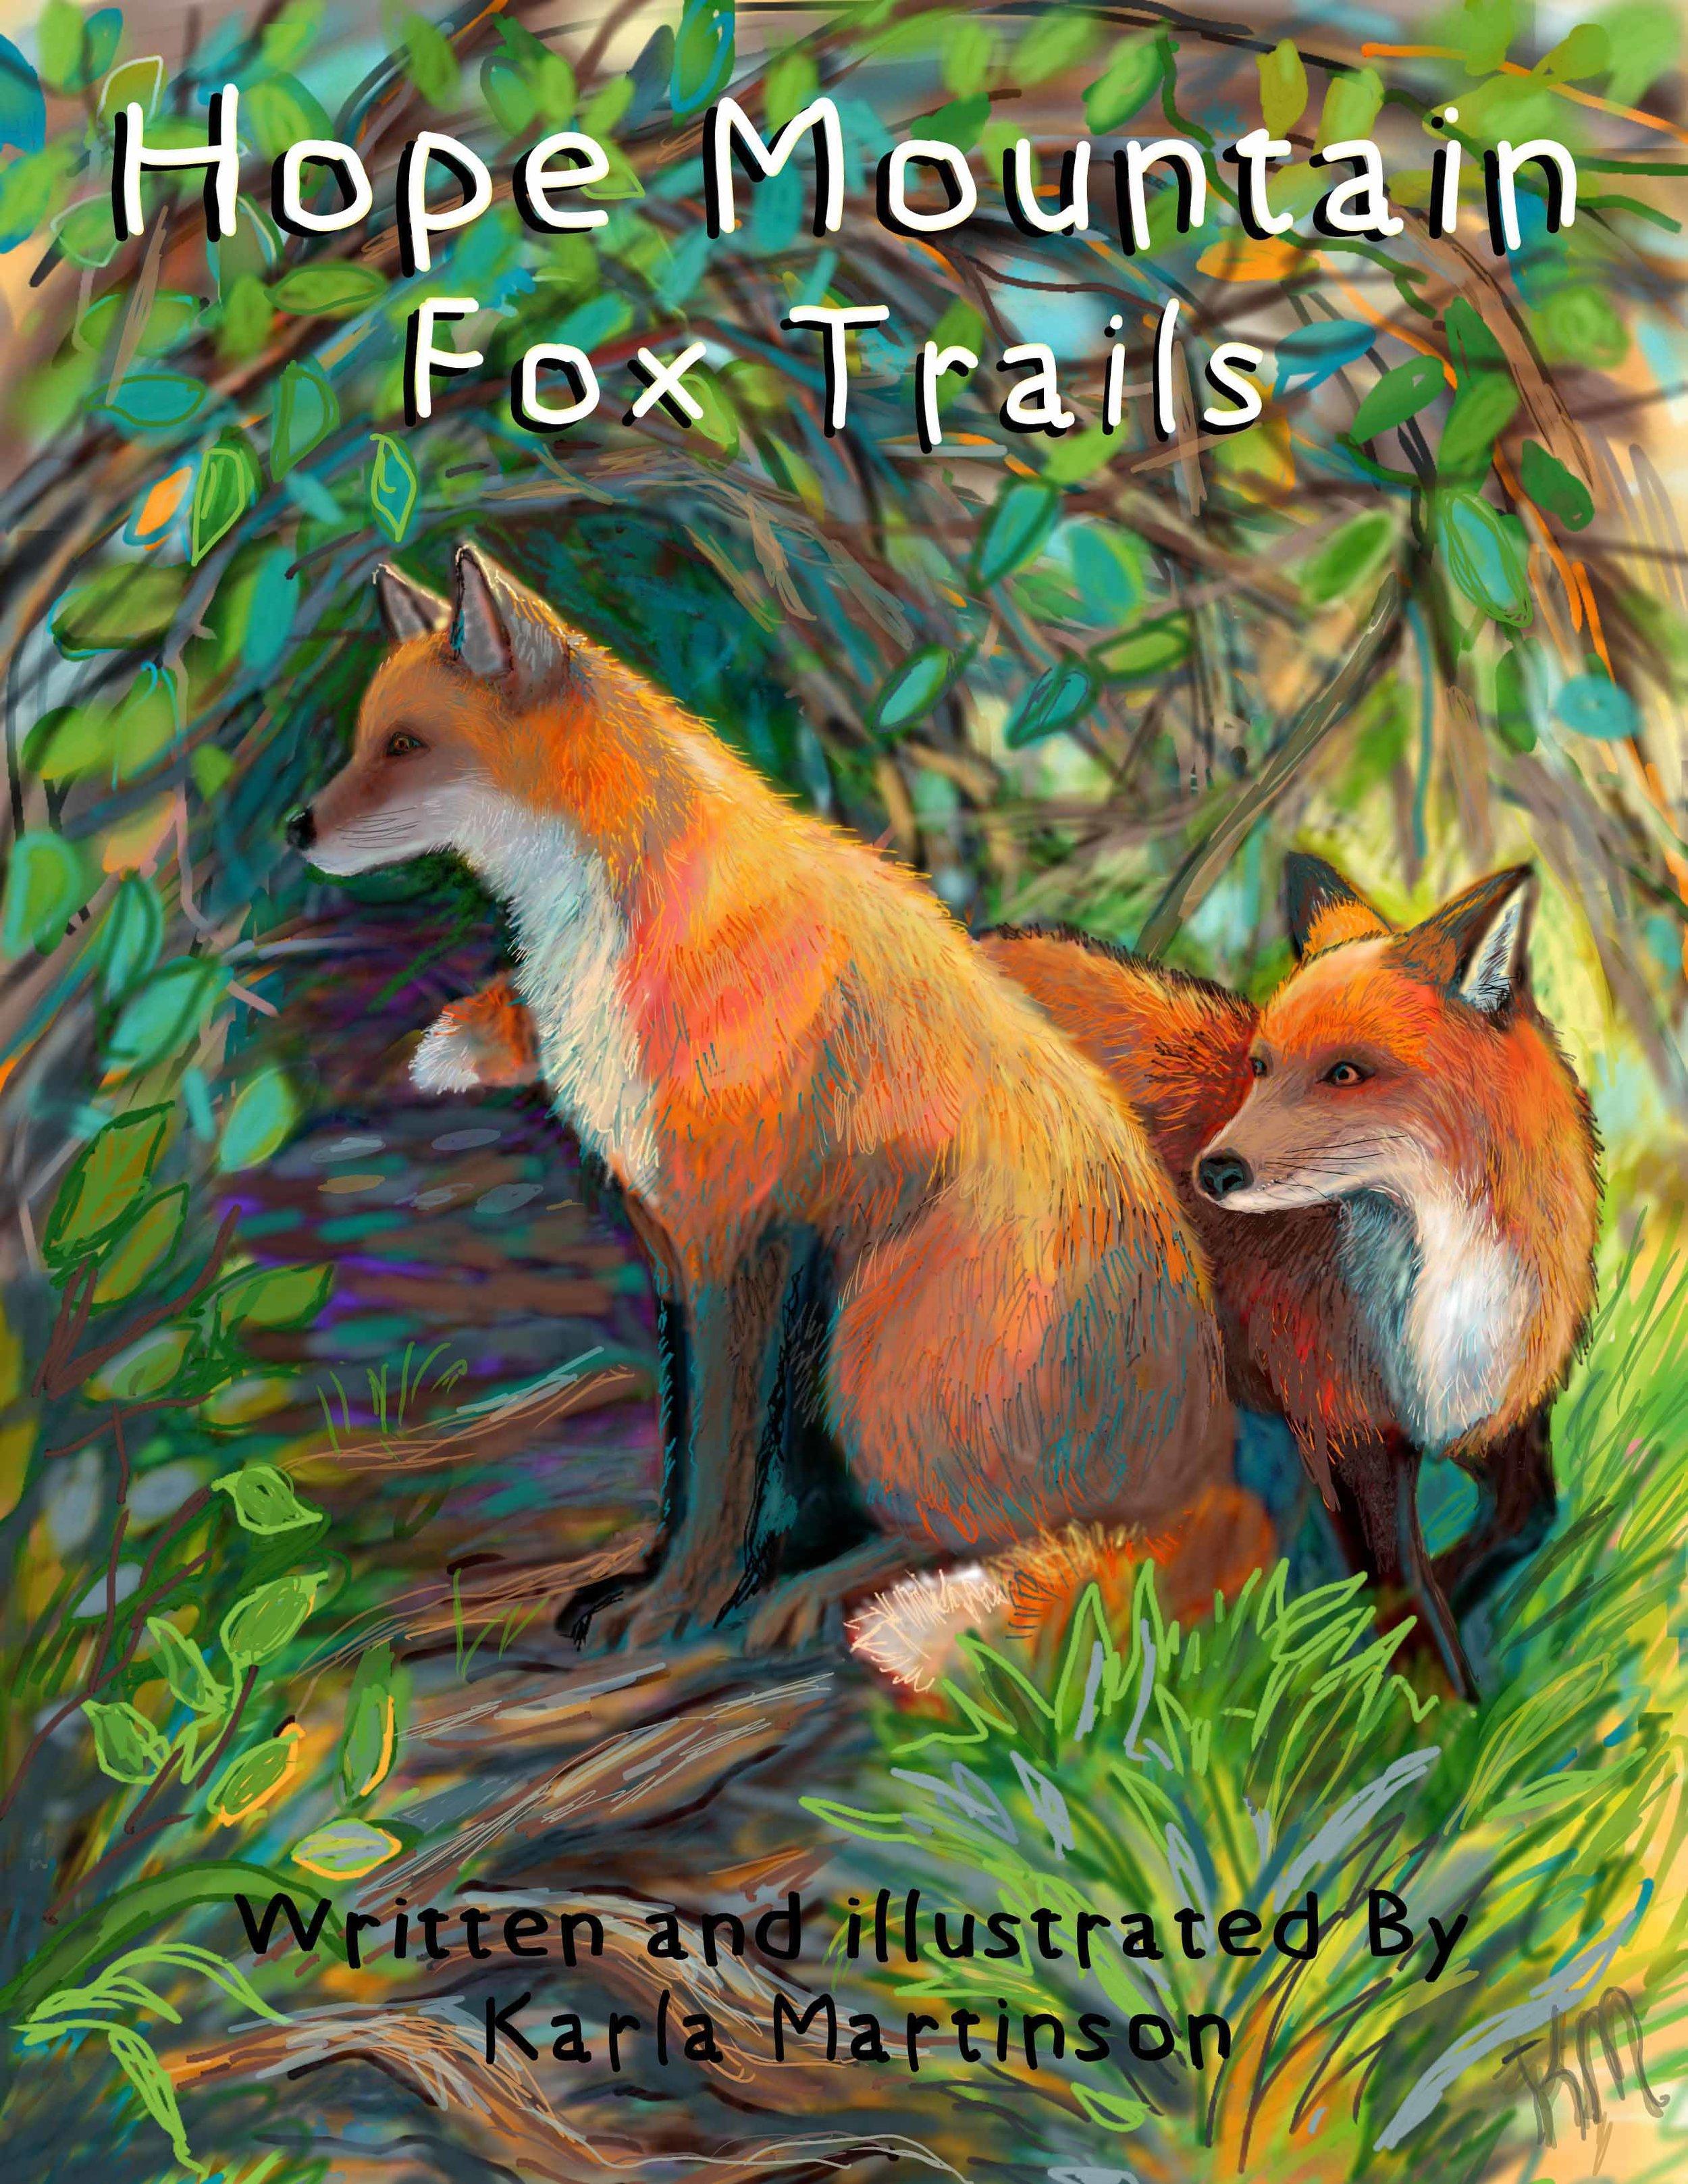 1a Fox Trails Book Cover copy (1).jpg